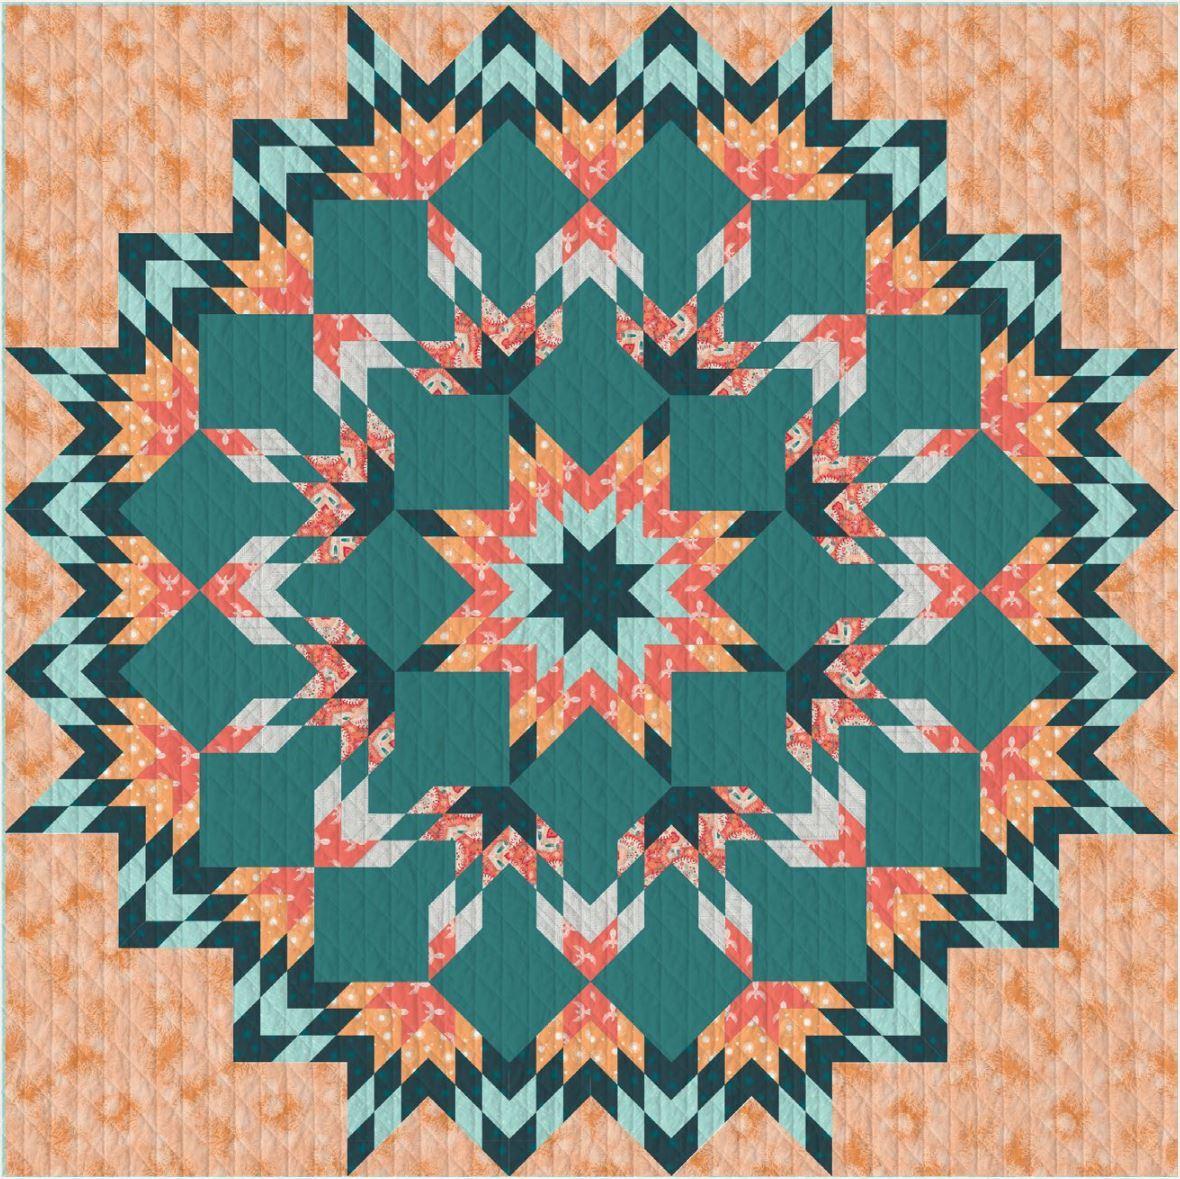 Onward and Upward Quilt Pattern